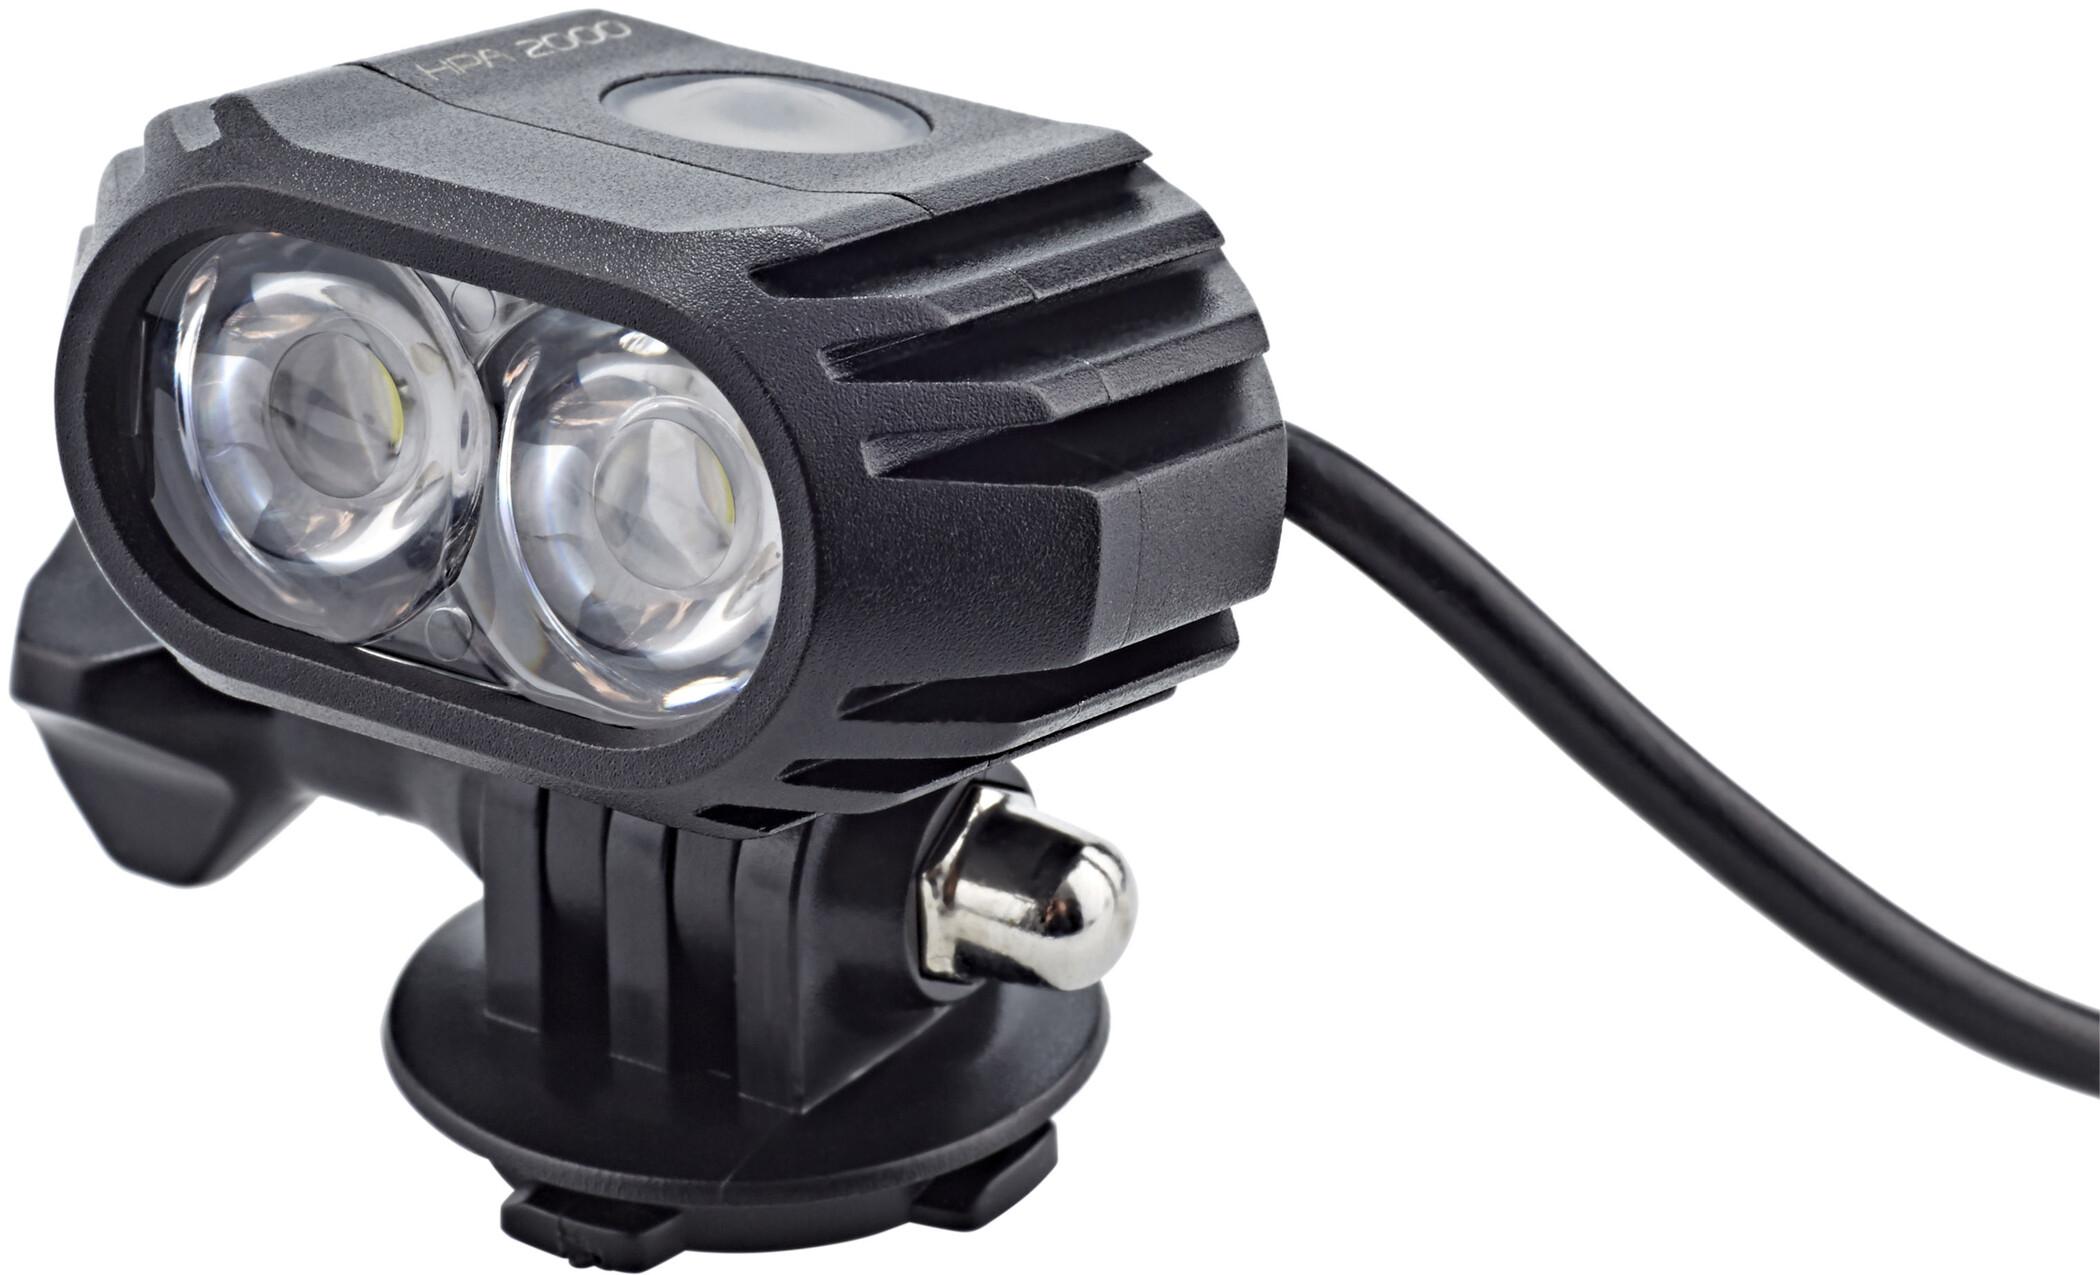 Cube Hpa 2000 Led Licht Helmlampe Online Kaufen Fahrrad De